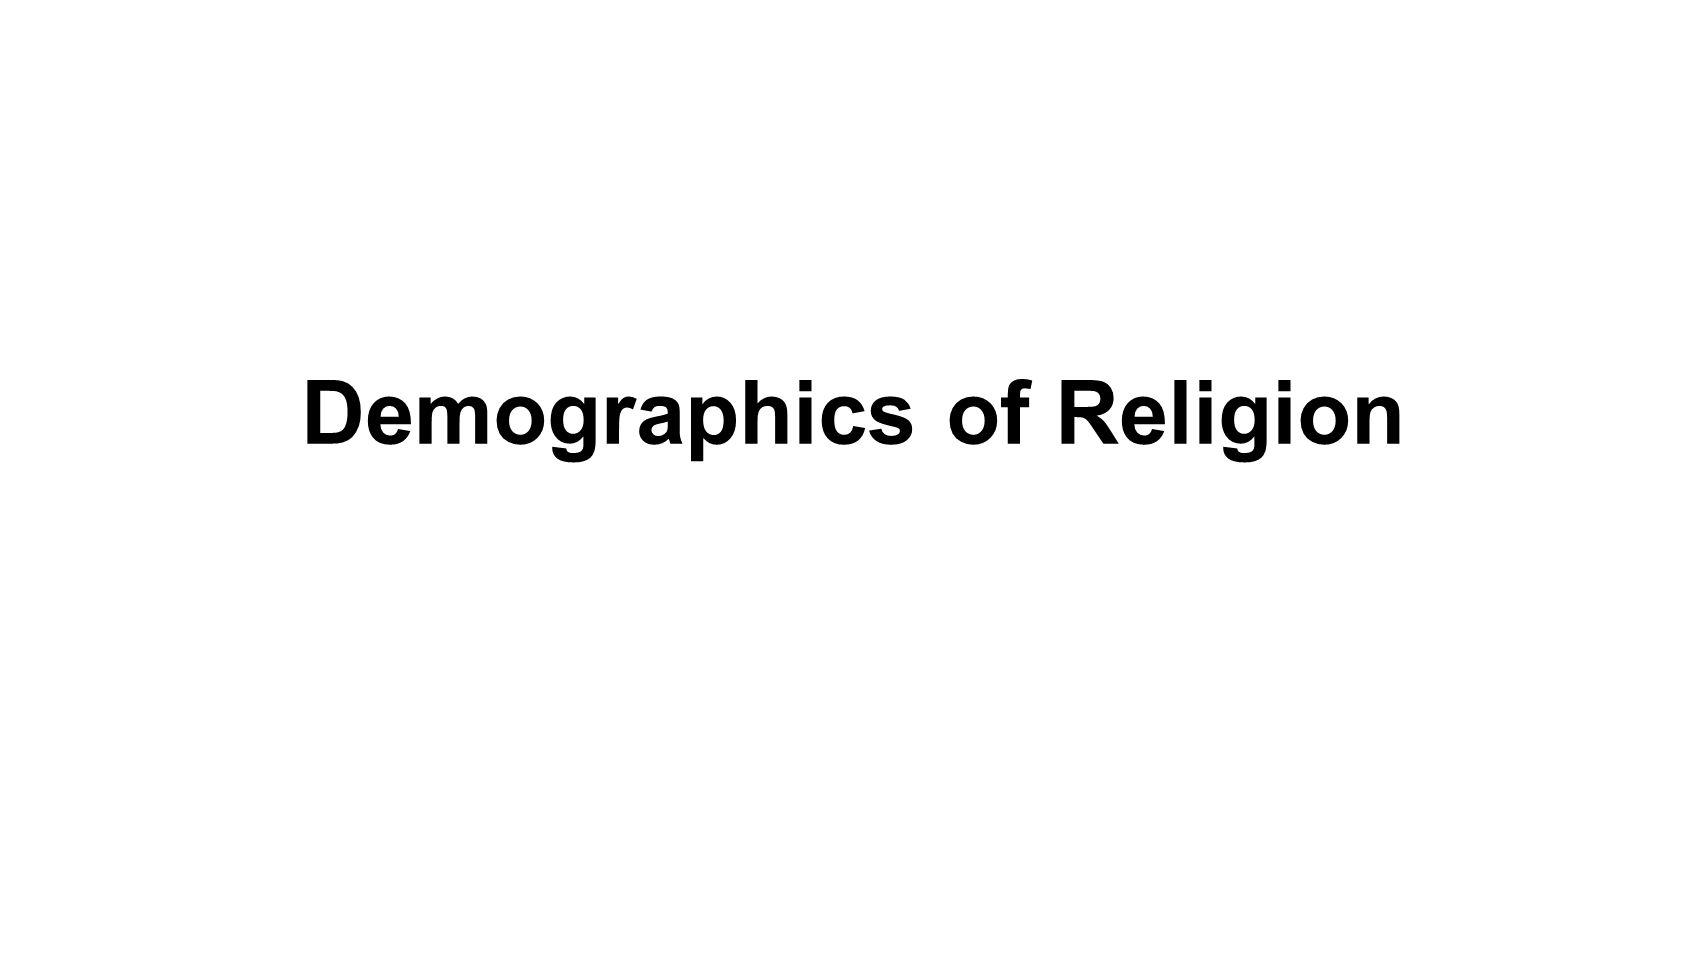 Demographics of Religion